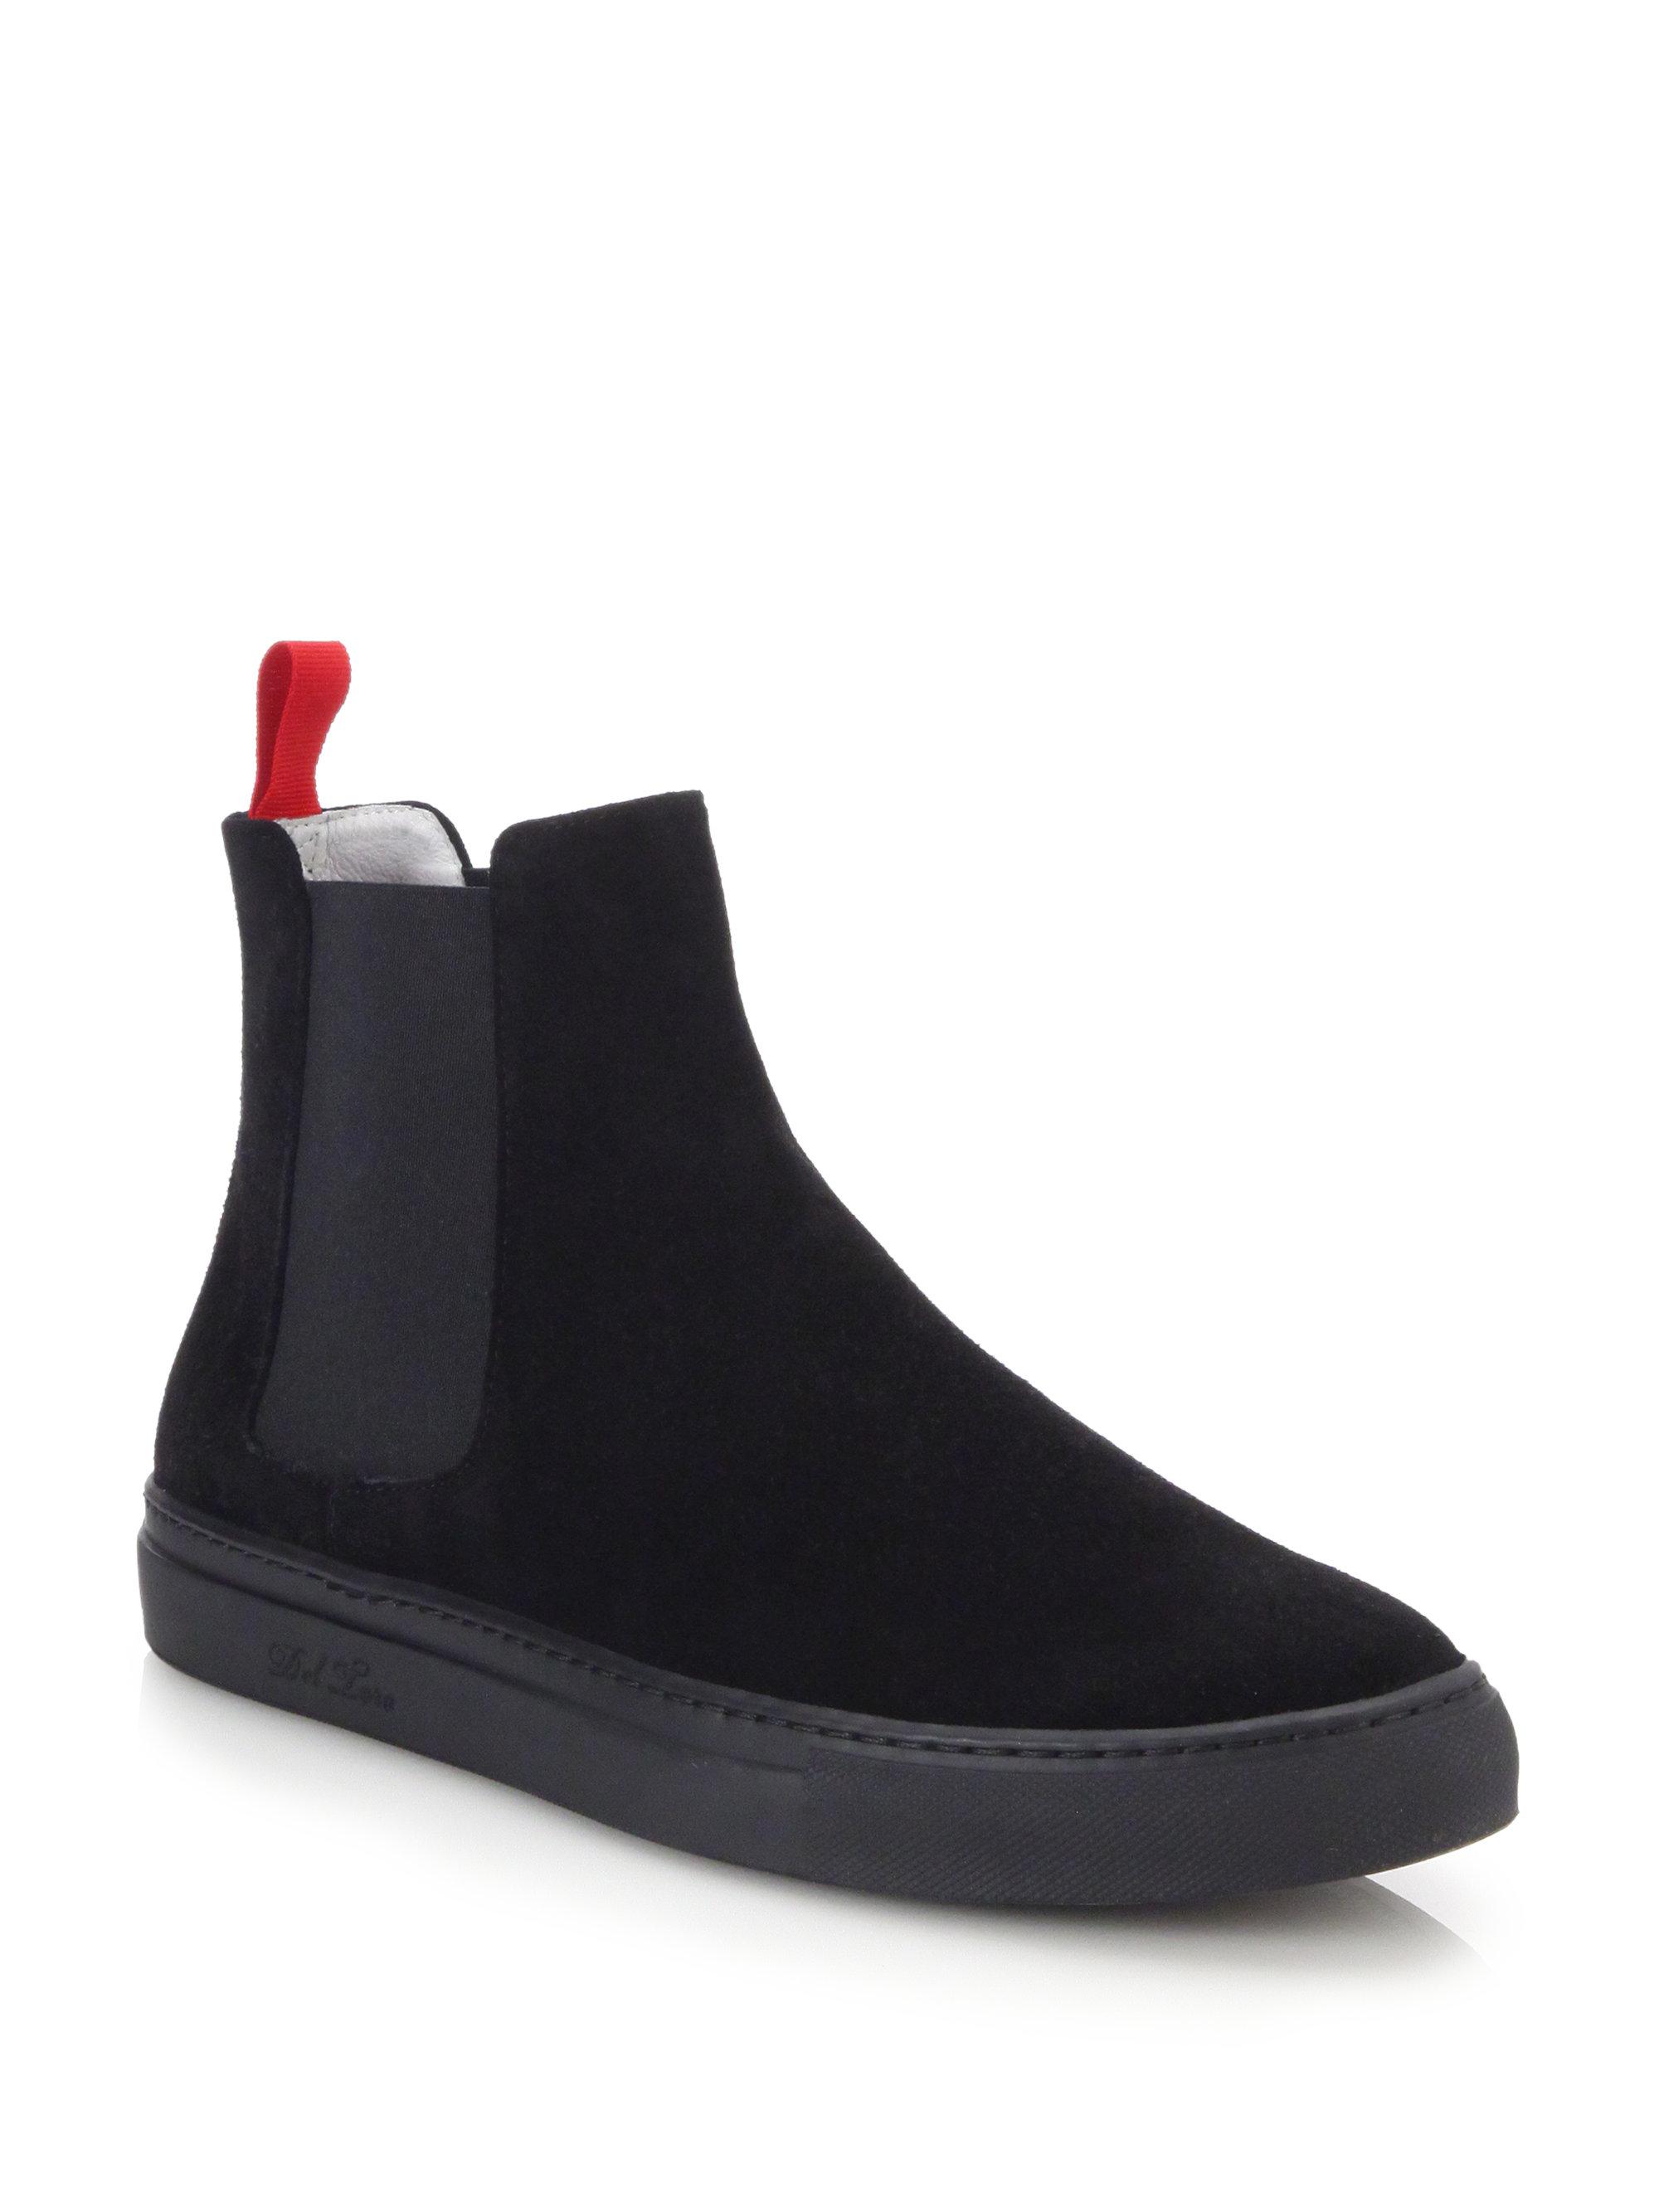 Globe Shoes For Men Images Olukai